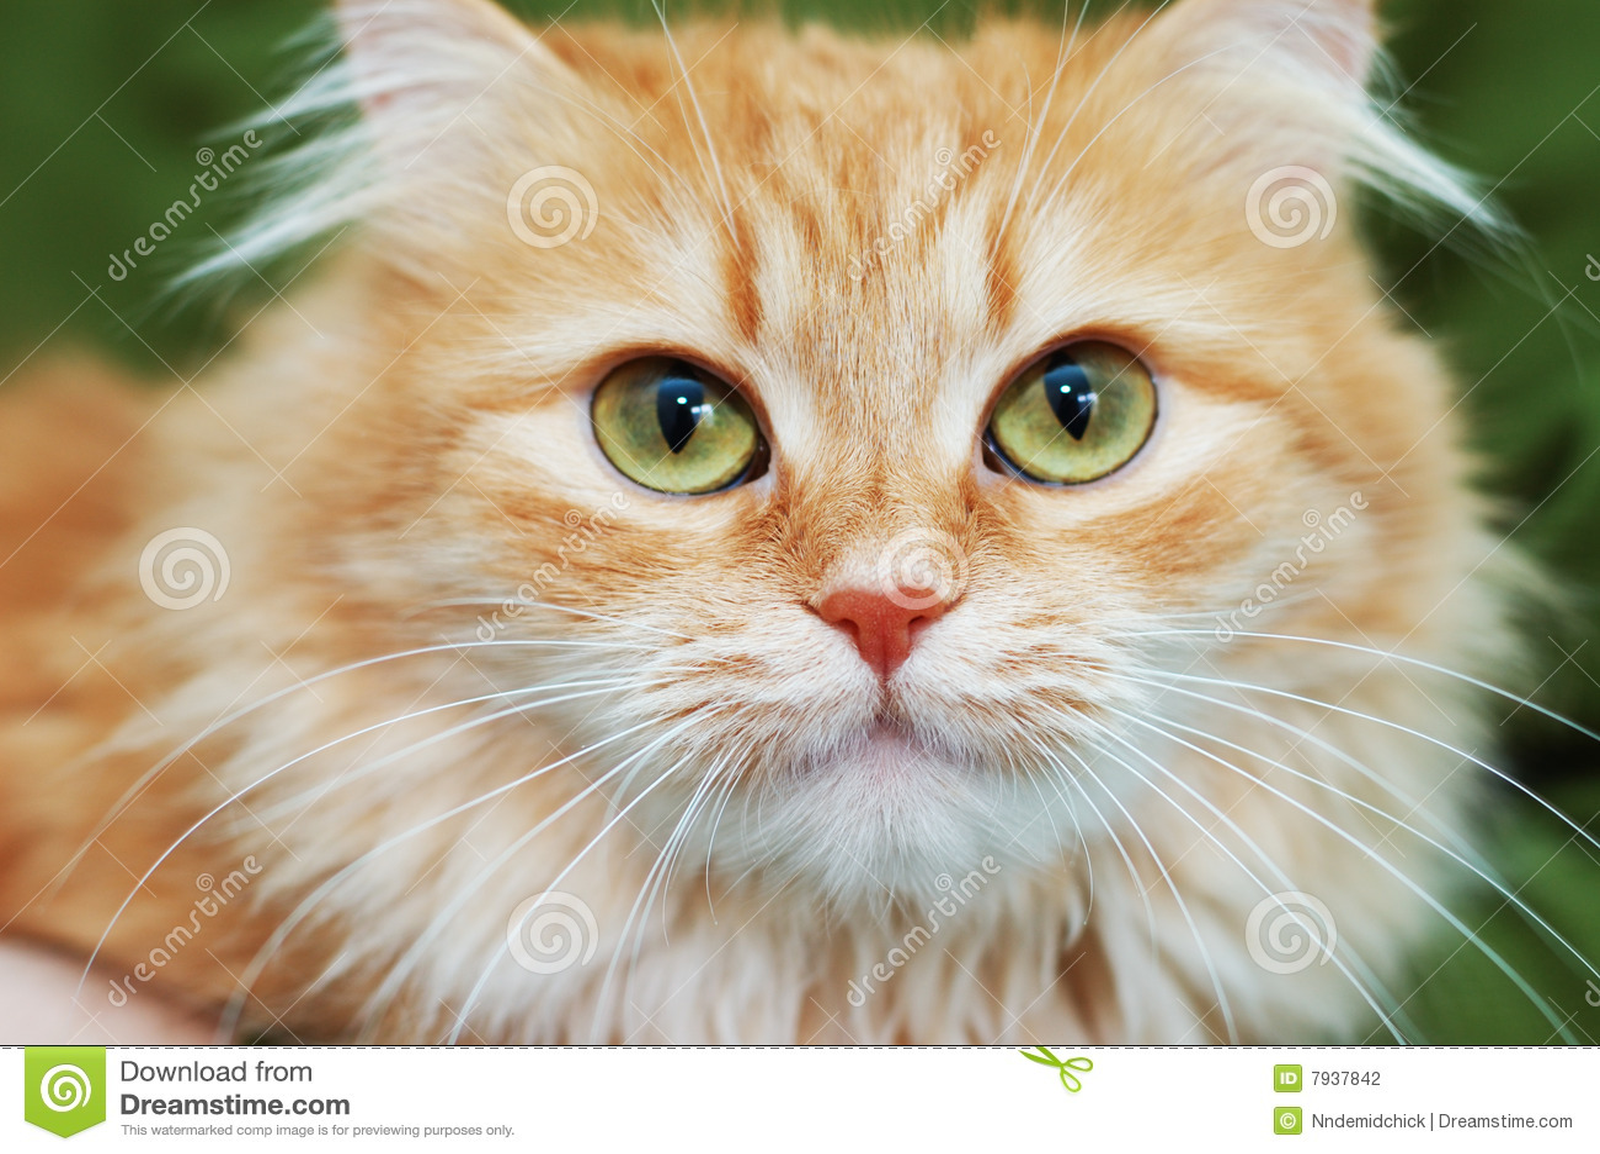 Green Cat Red Eyes